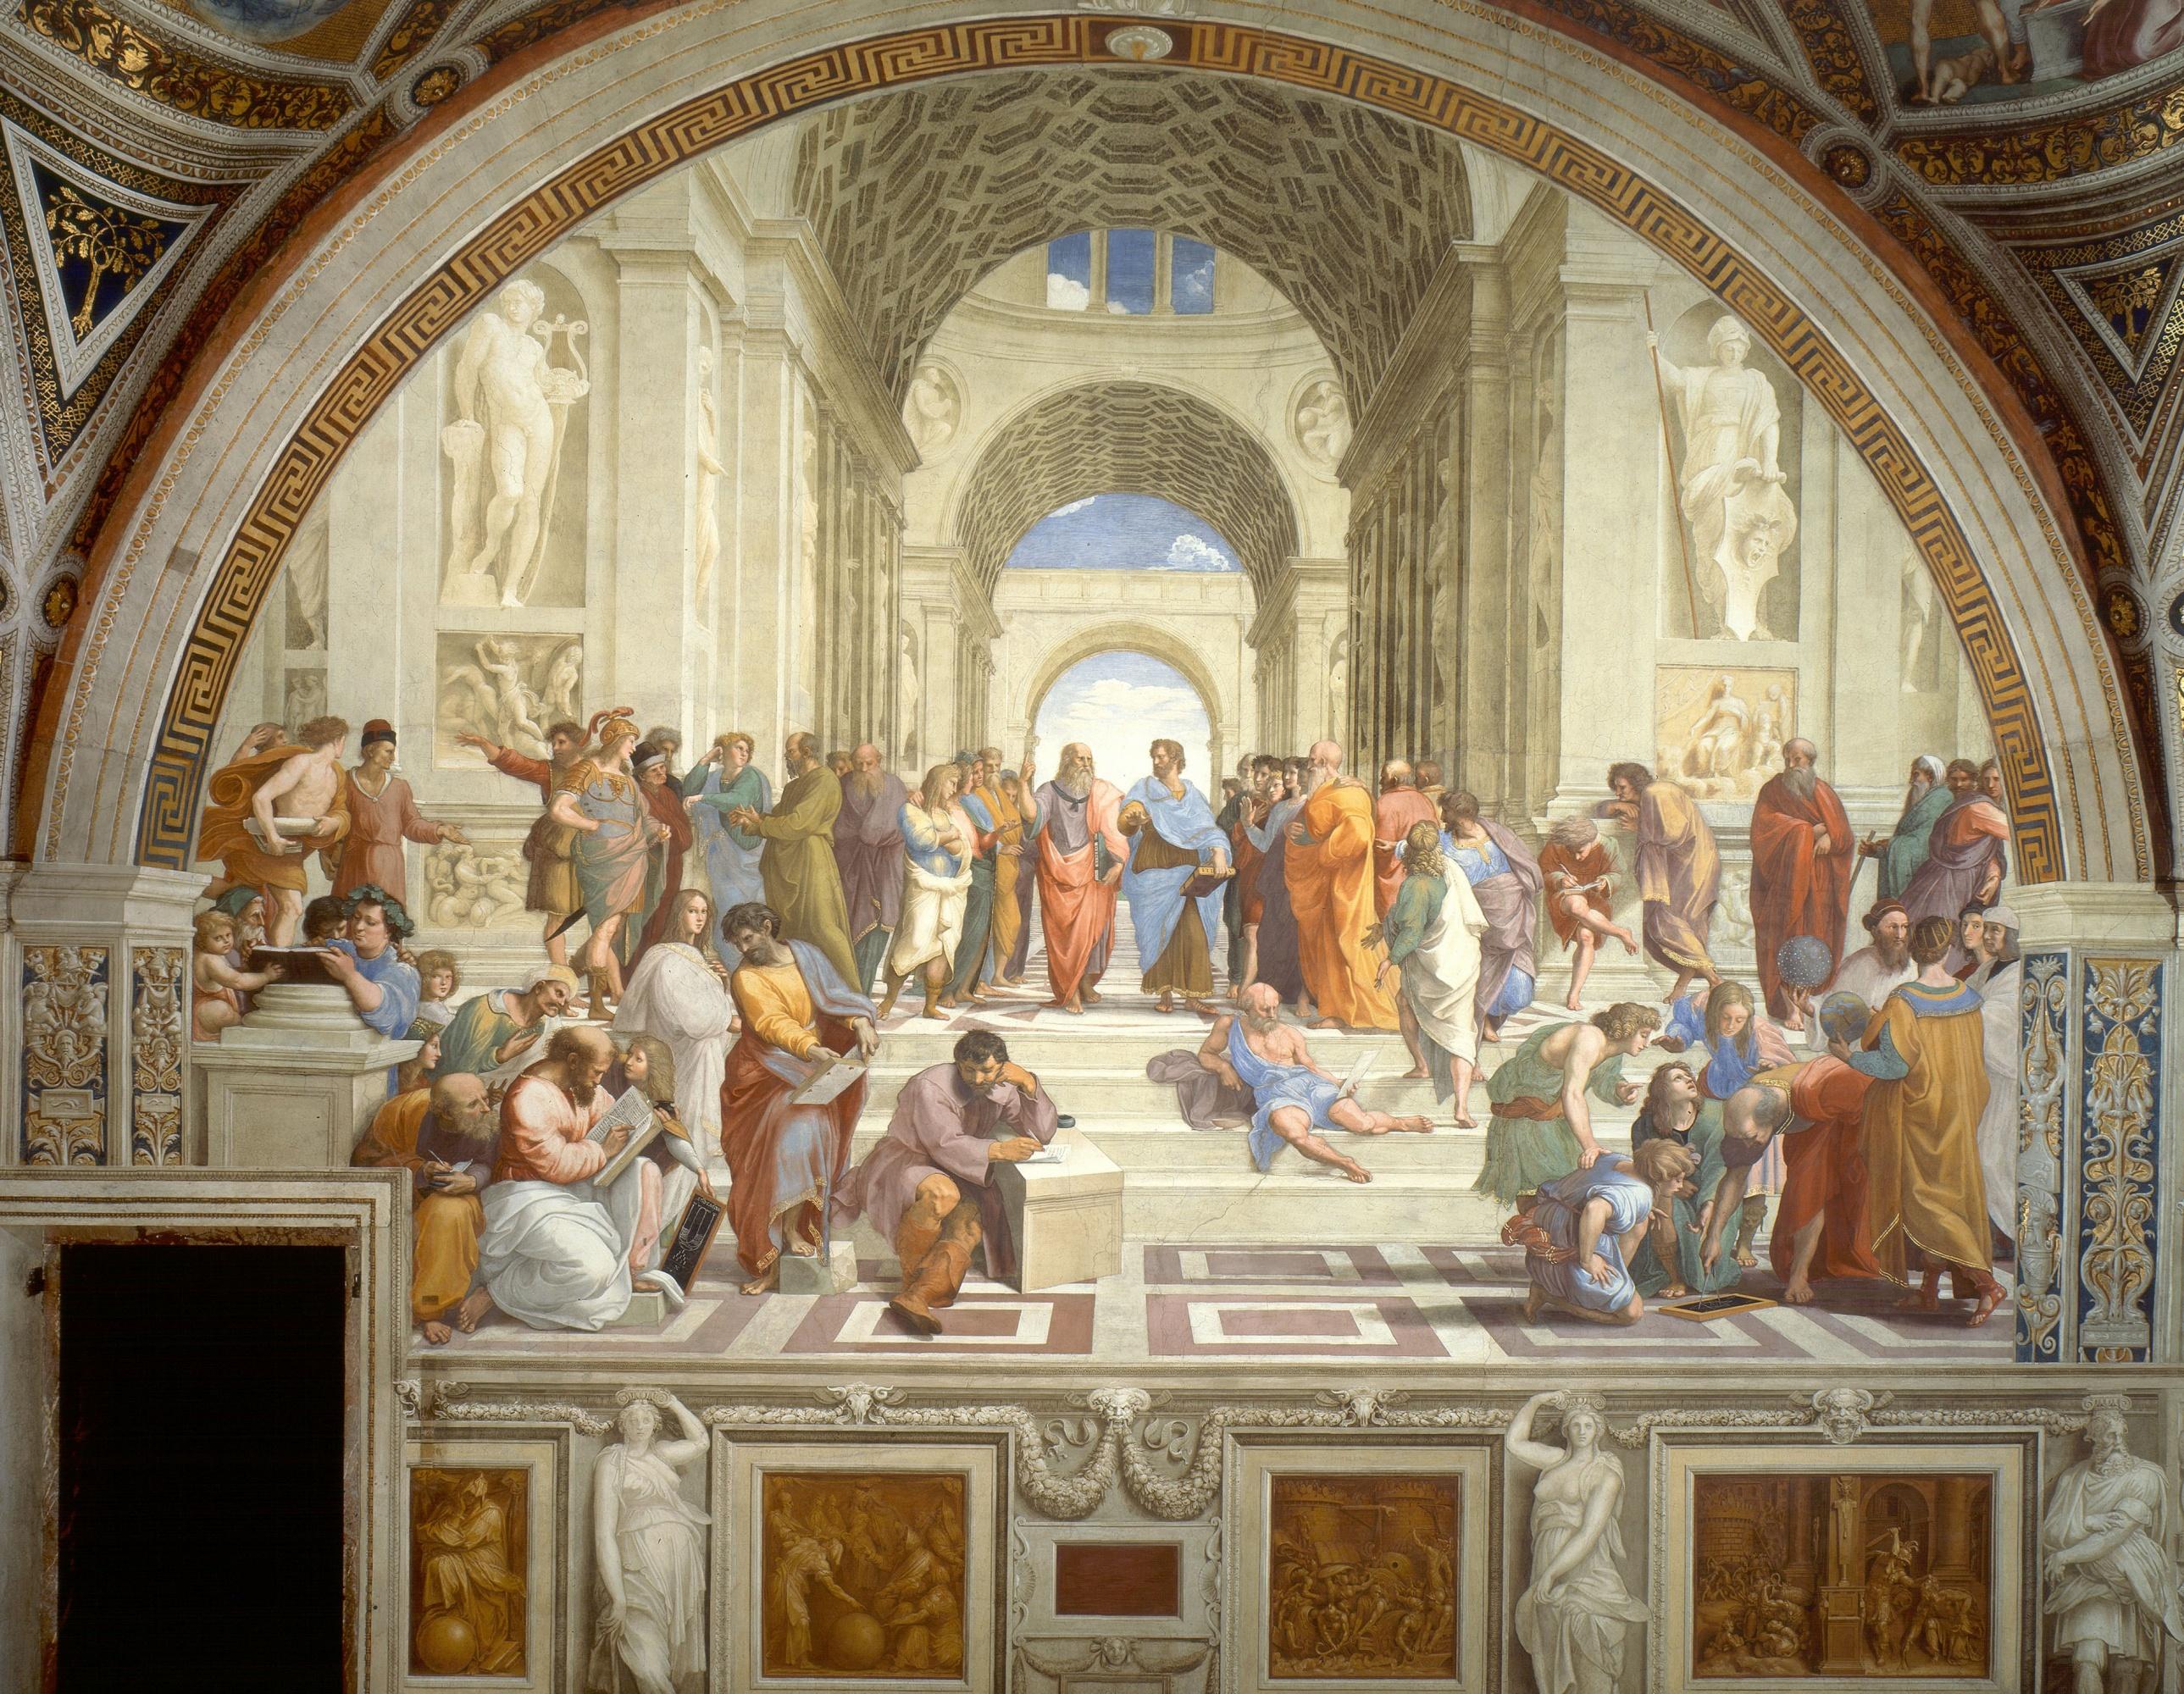 The school of Athens by Raffaello